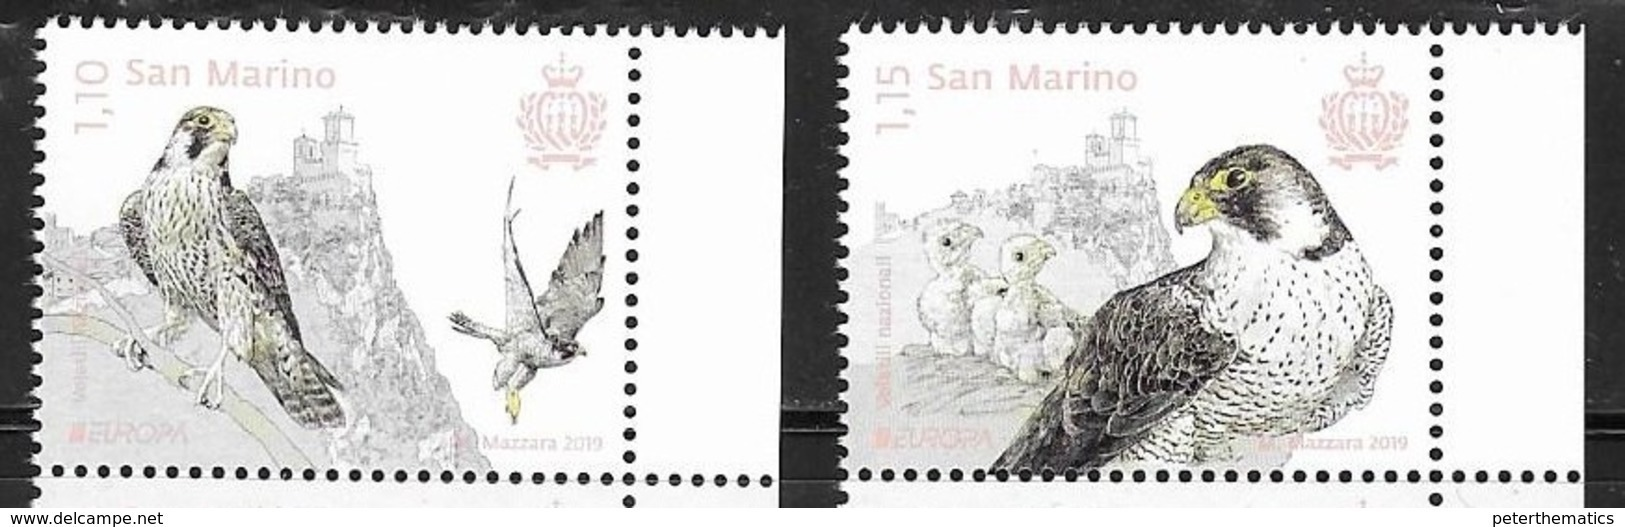 SAN MARINO, 2019, MNH, EUROPA, BIRDS, BIRDS OF PREY, 2v - 2019